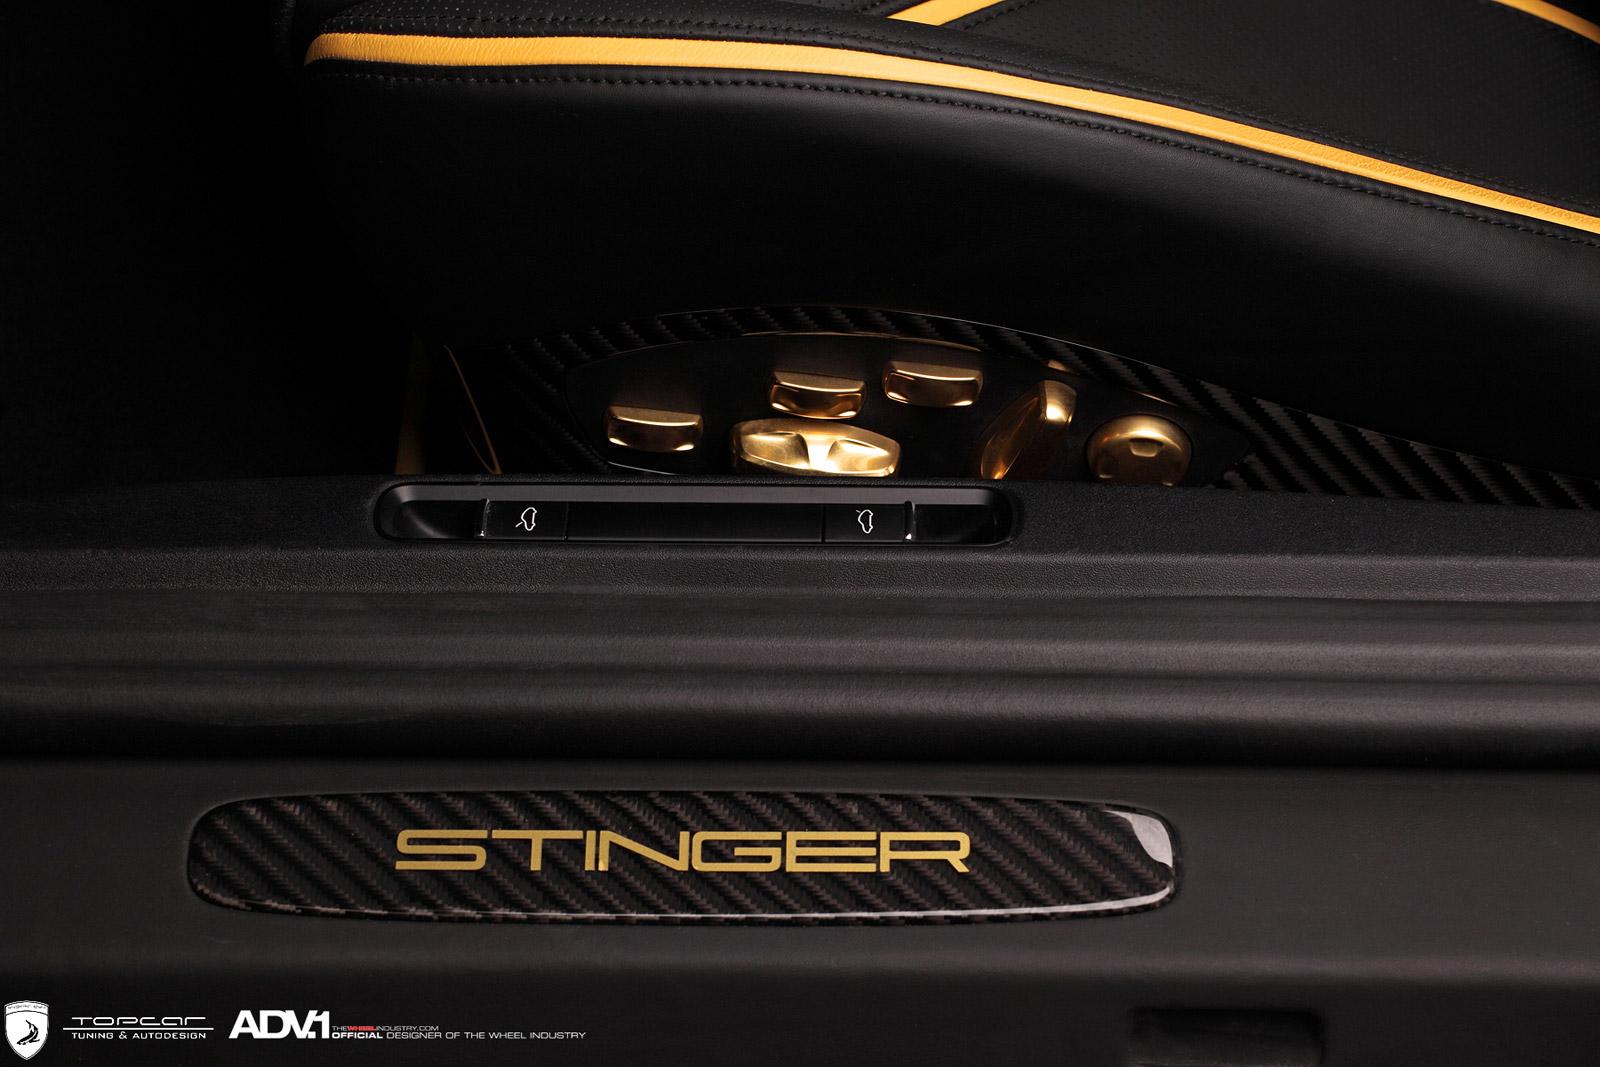 porsche-911-turbo-typ-991-topcar-stinger-gtr-030